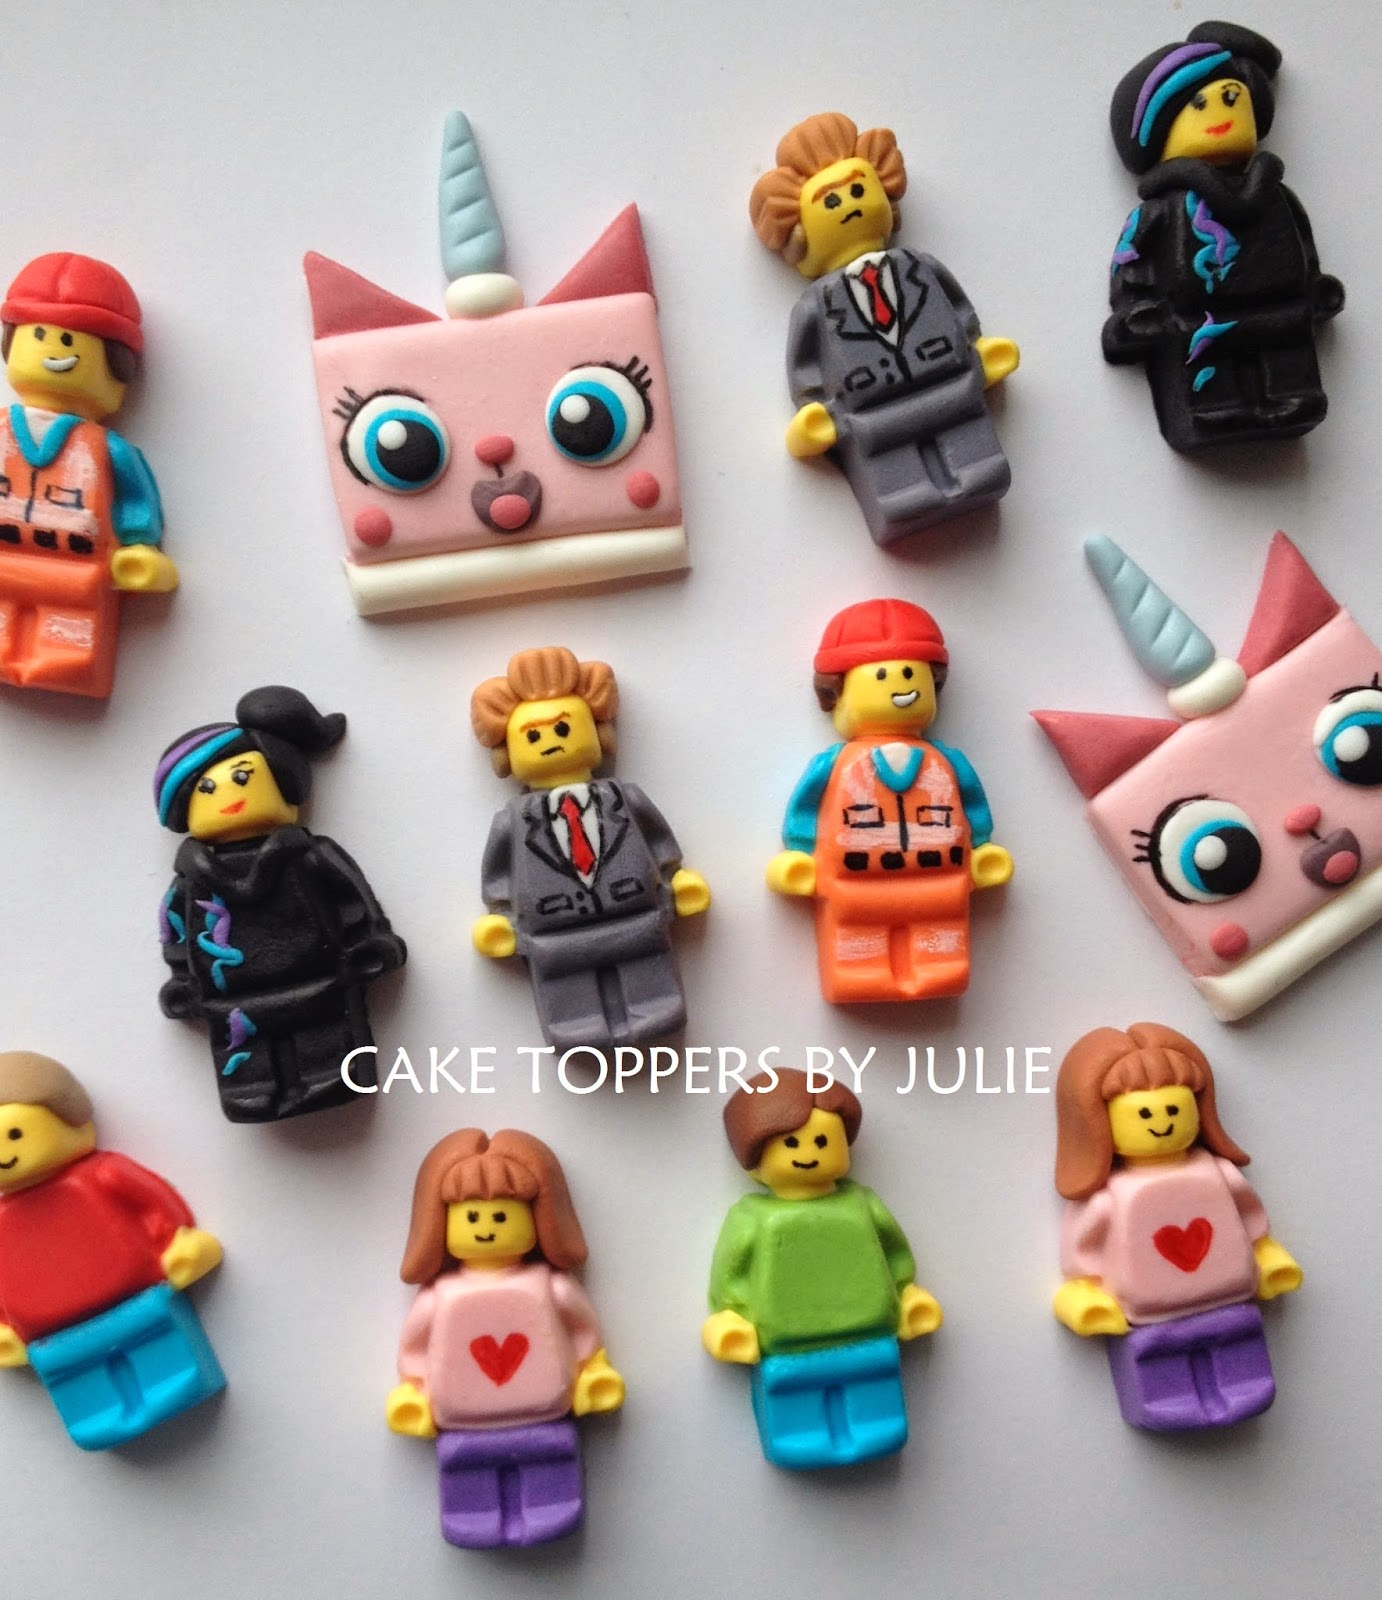 Gumpaste Cake Toppers